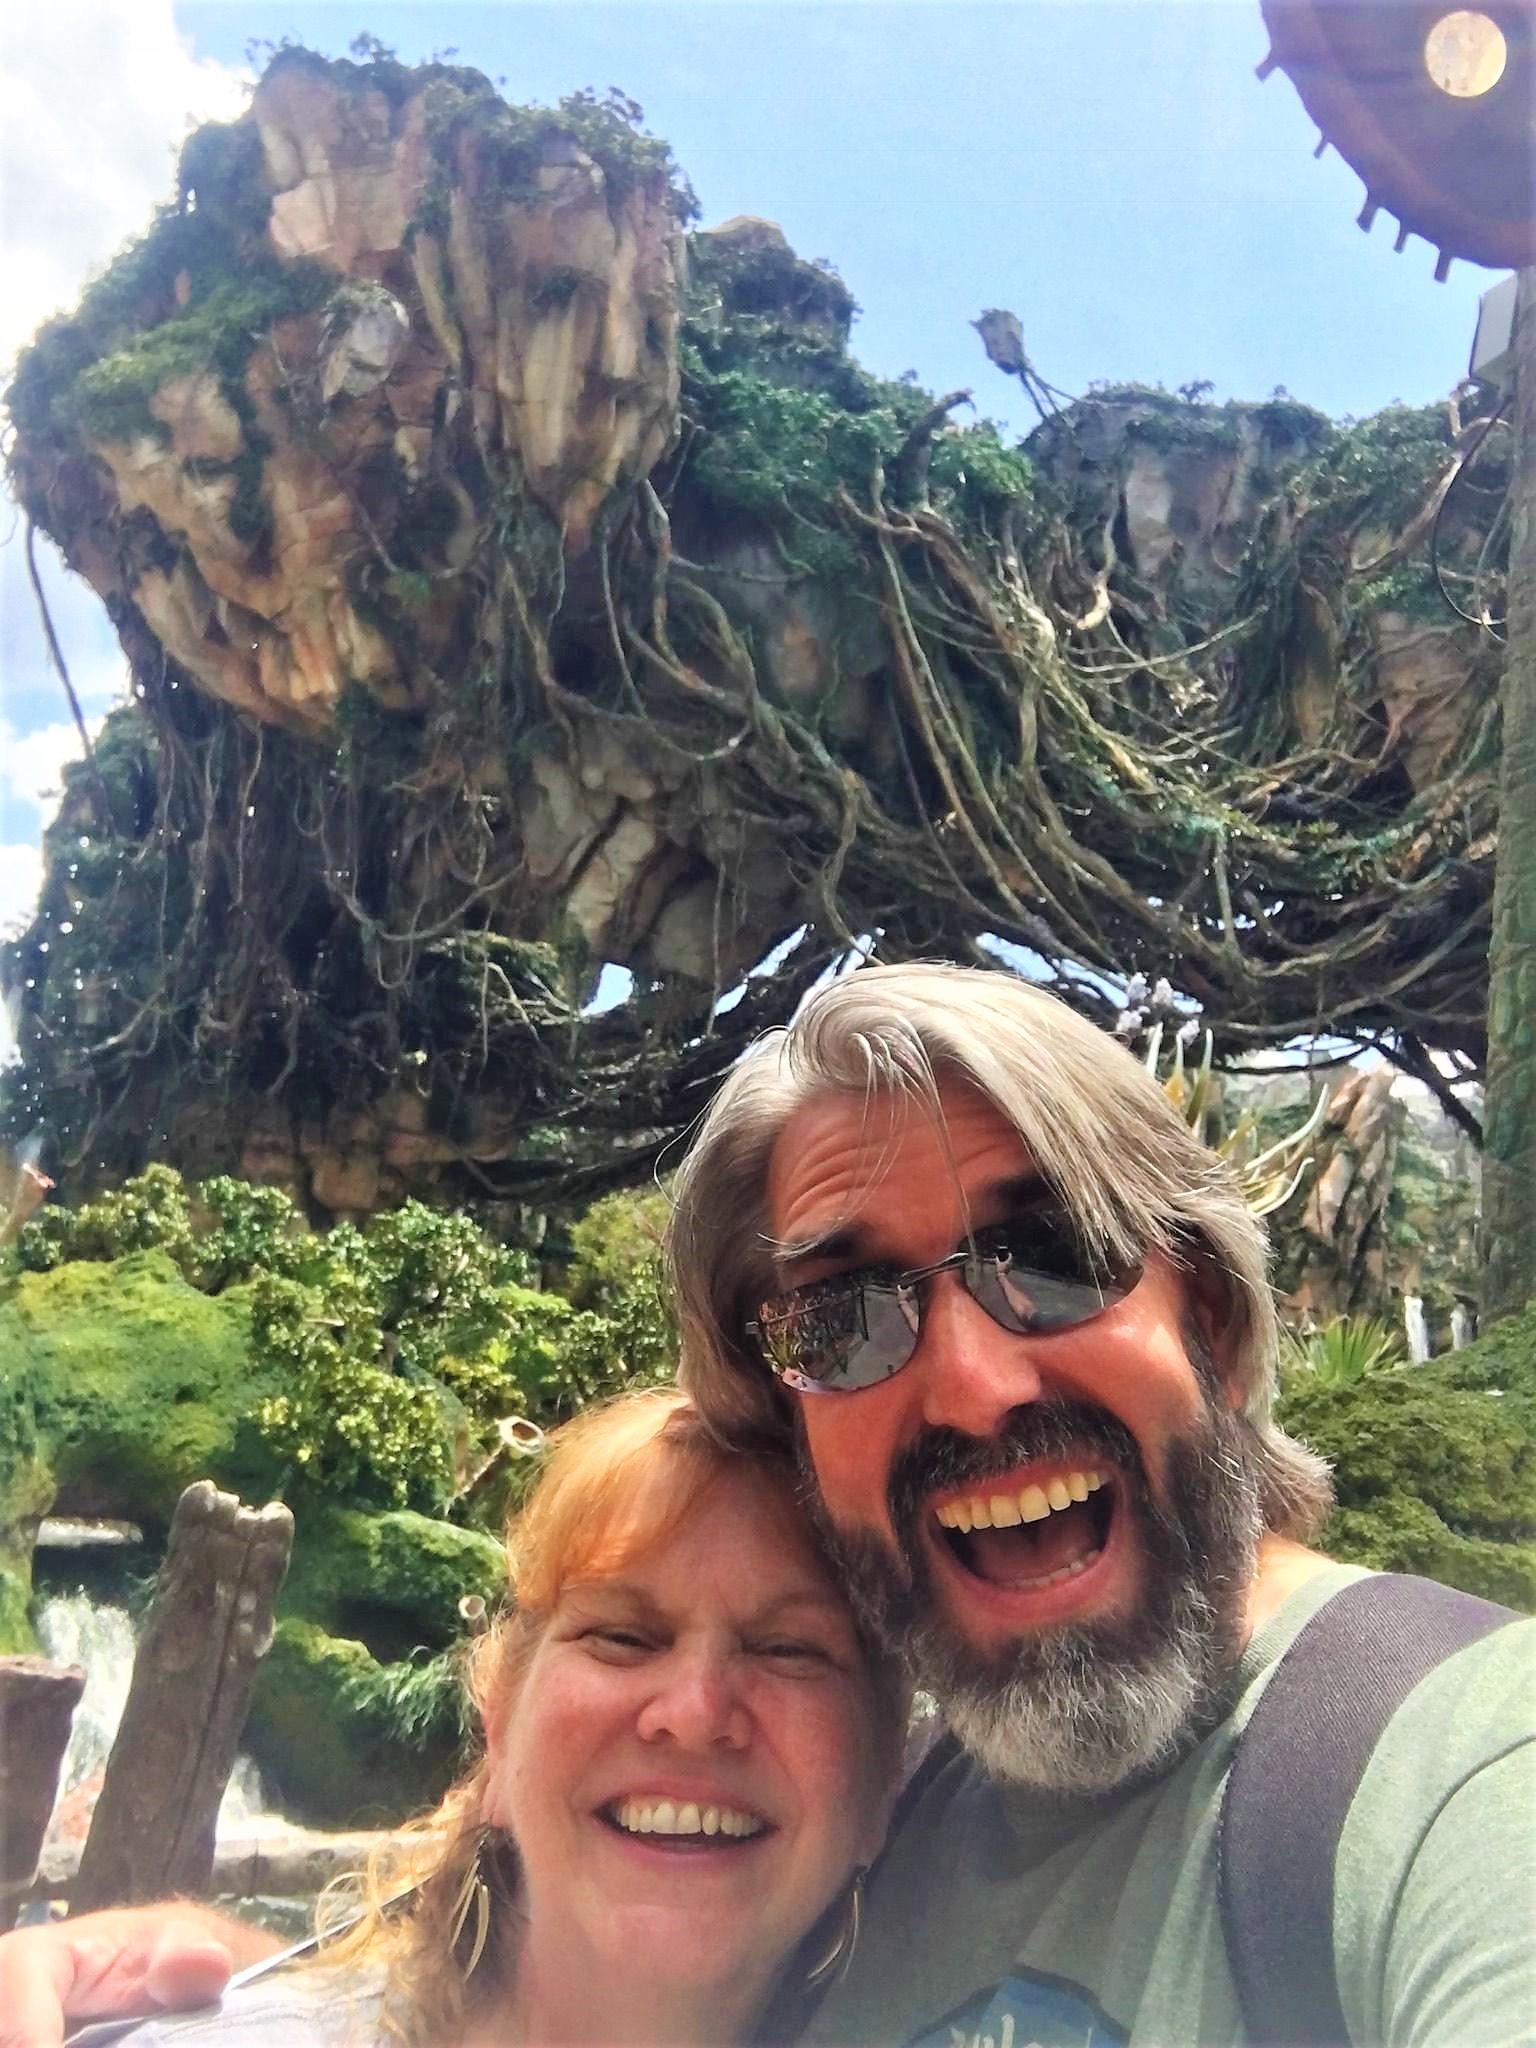 Tom & Michelle at Pandora - The World of Avatar at Disney's Animal Kingdom - Disney Dishes Pongu Lumpia Recipe